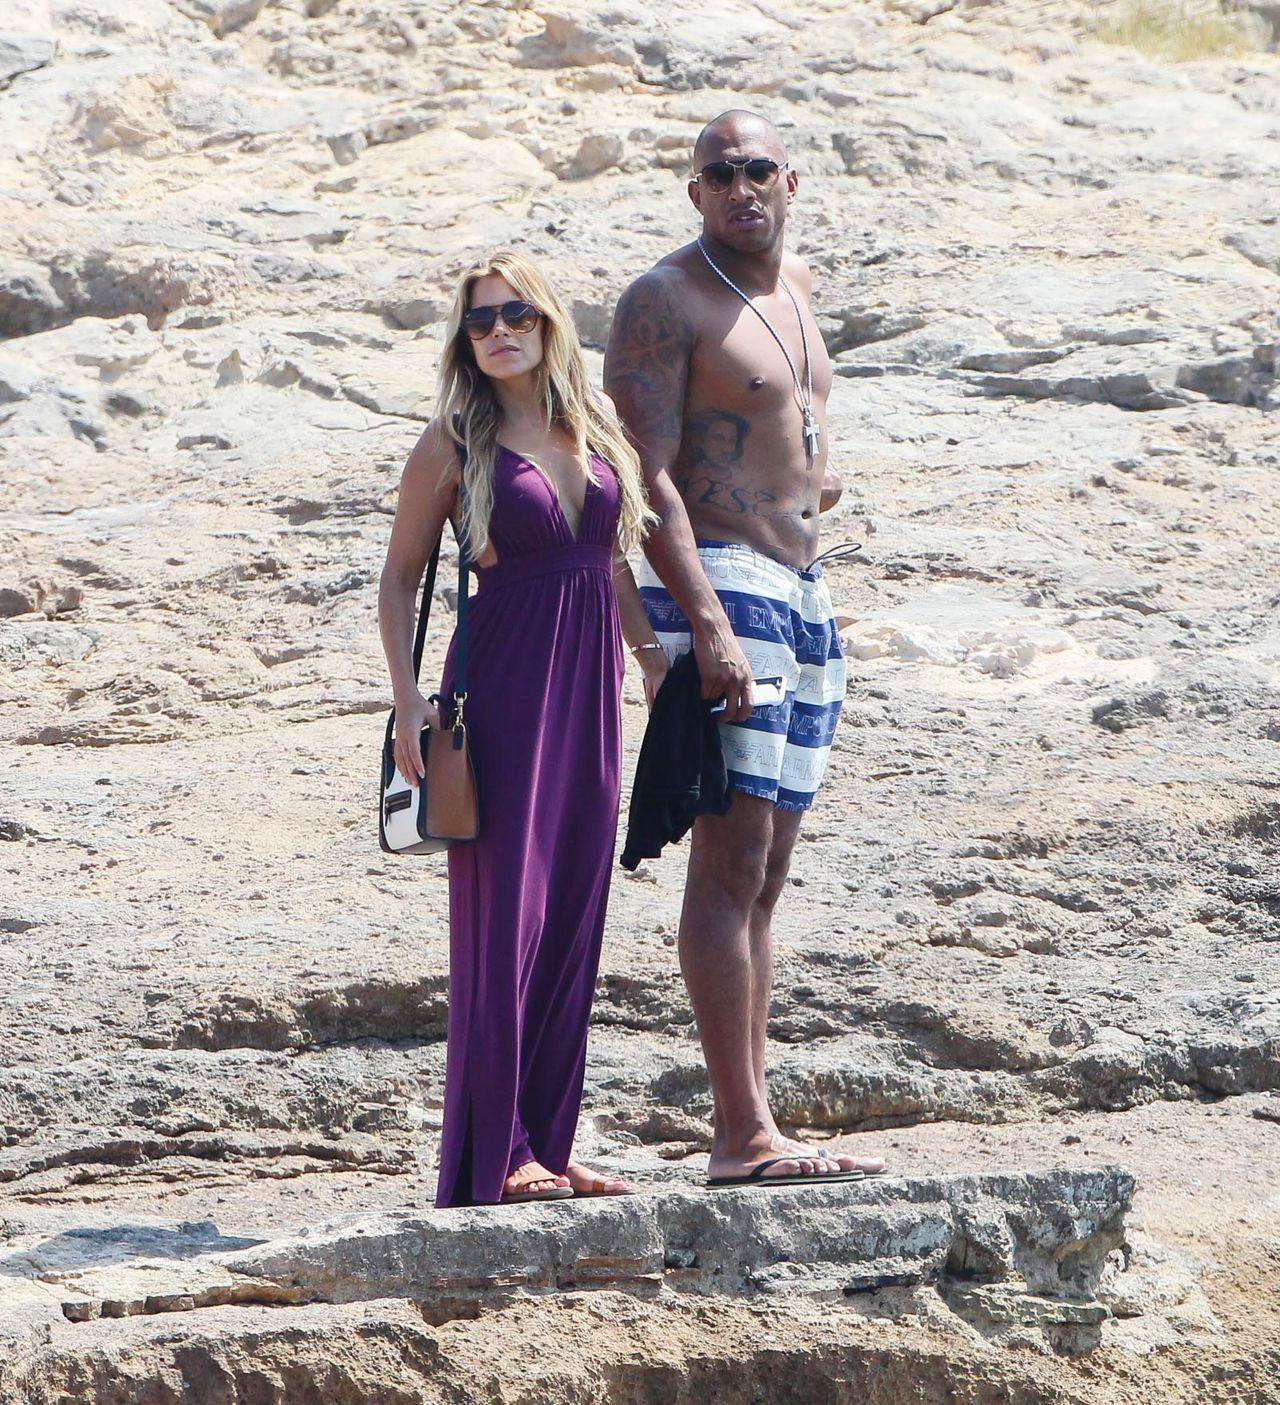 Sylvie Meis In A Bikini With Boyfriend In Formentera